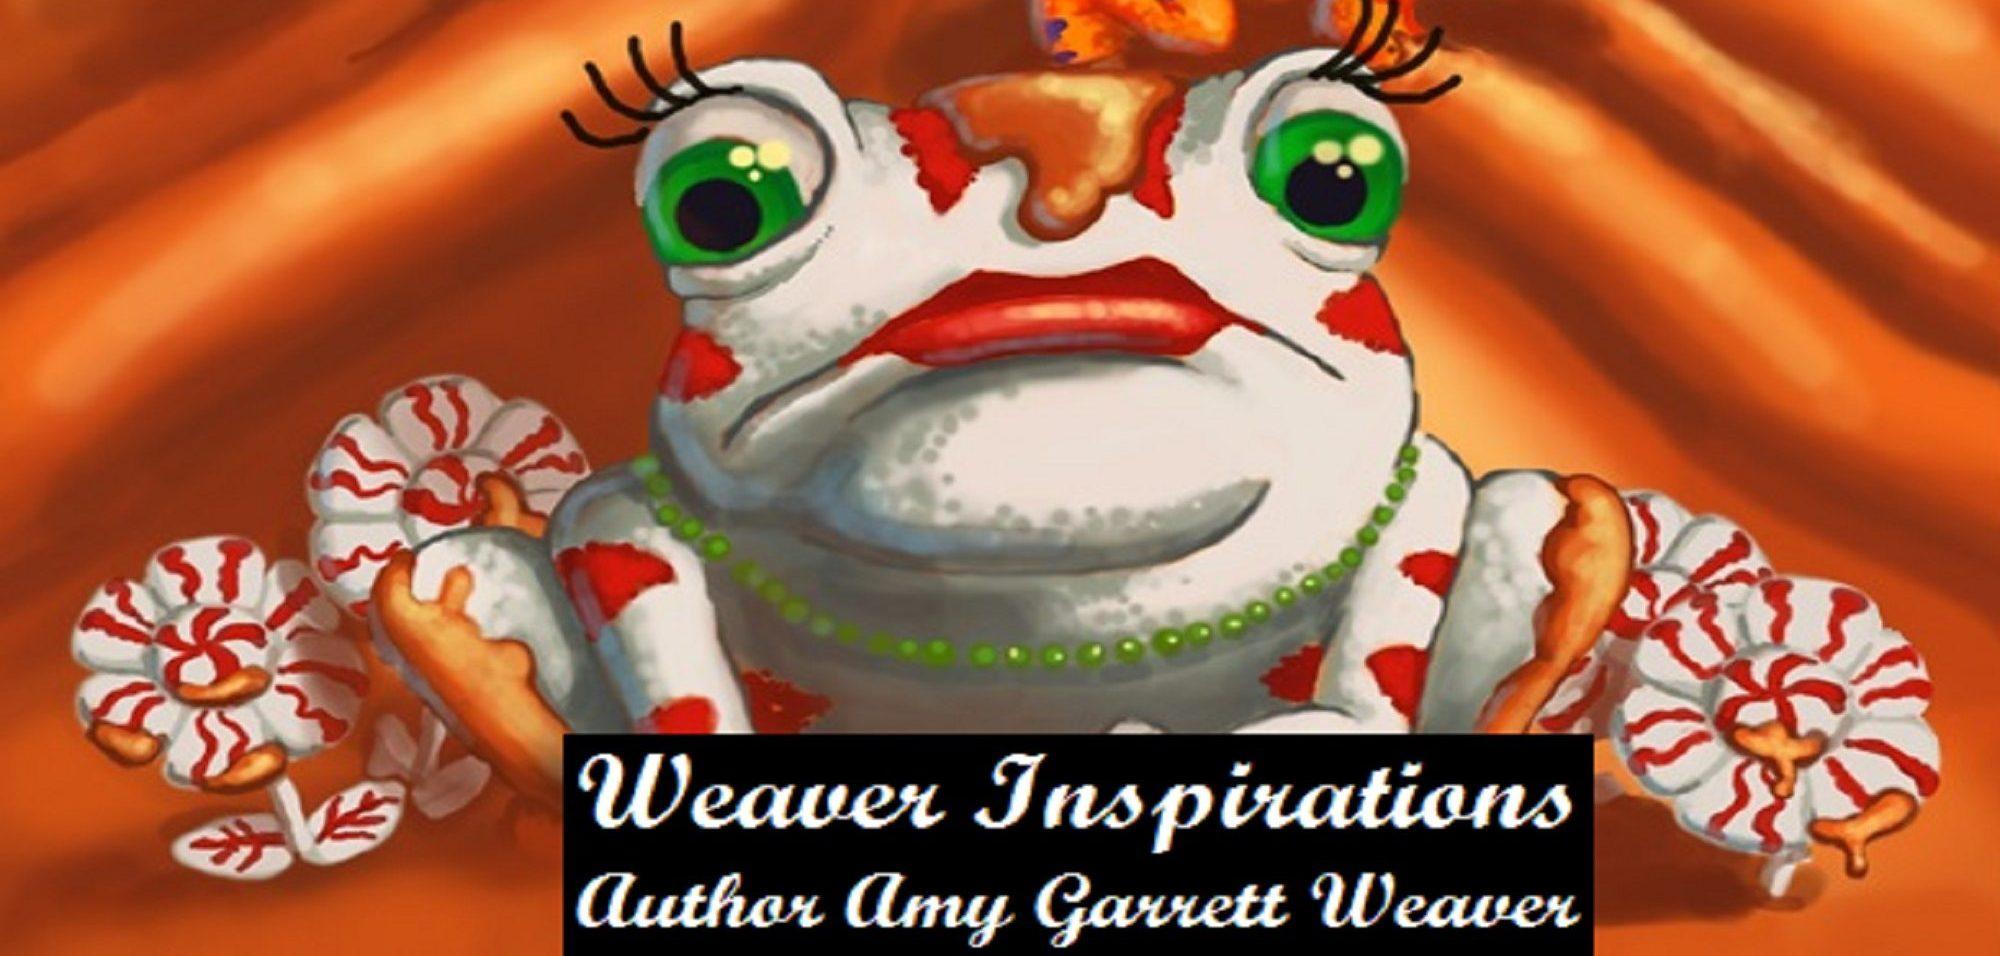 Weaver Inspirations - Author Amy Garrett Weaver